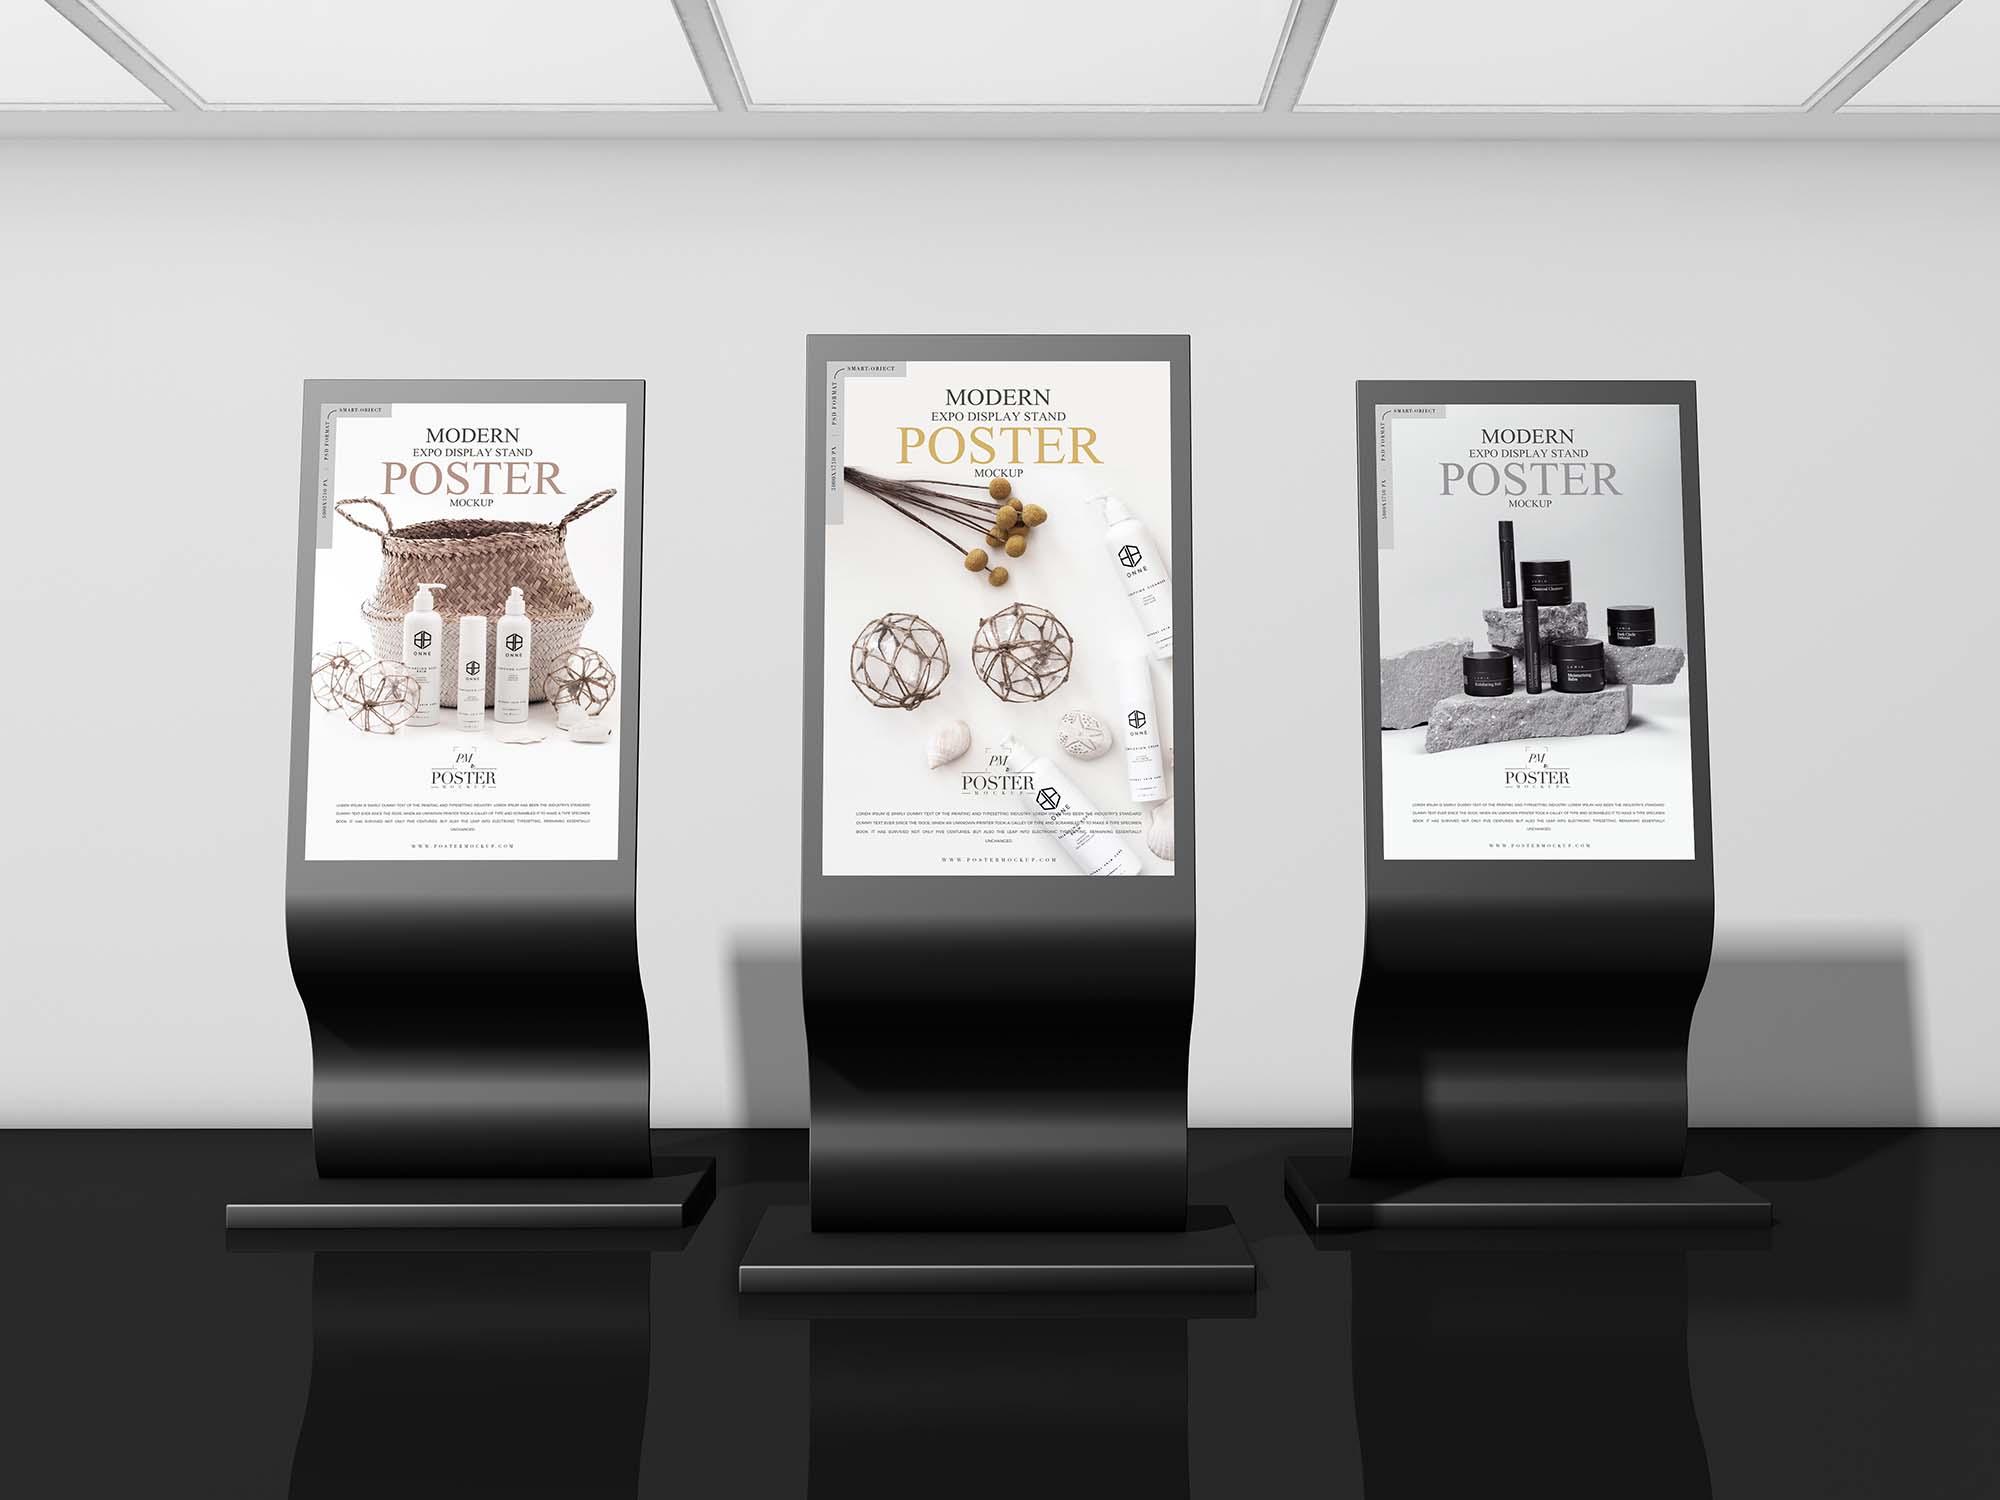 Expo Display Stand Poster Mockup